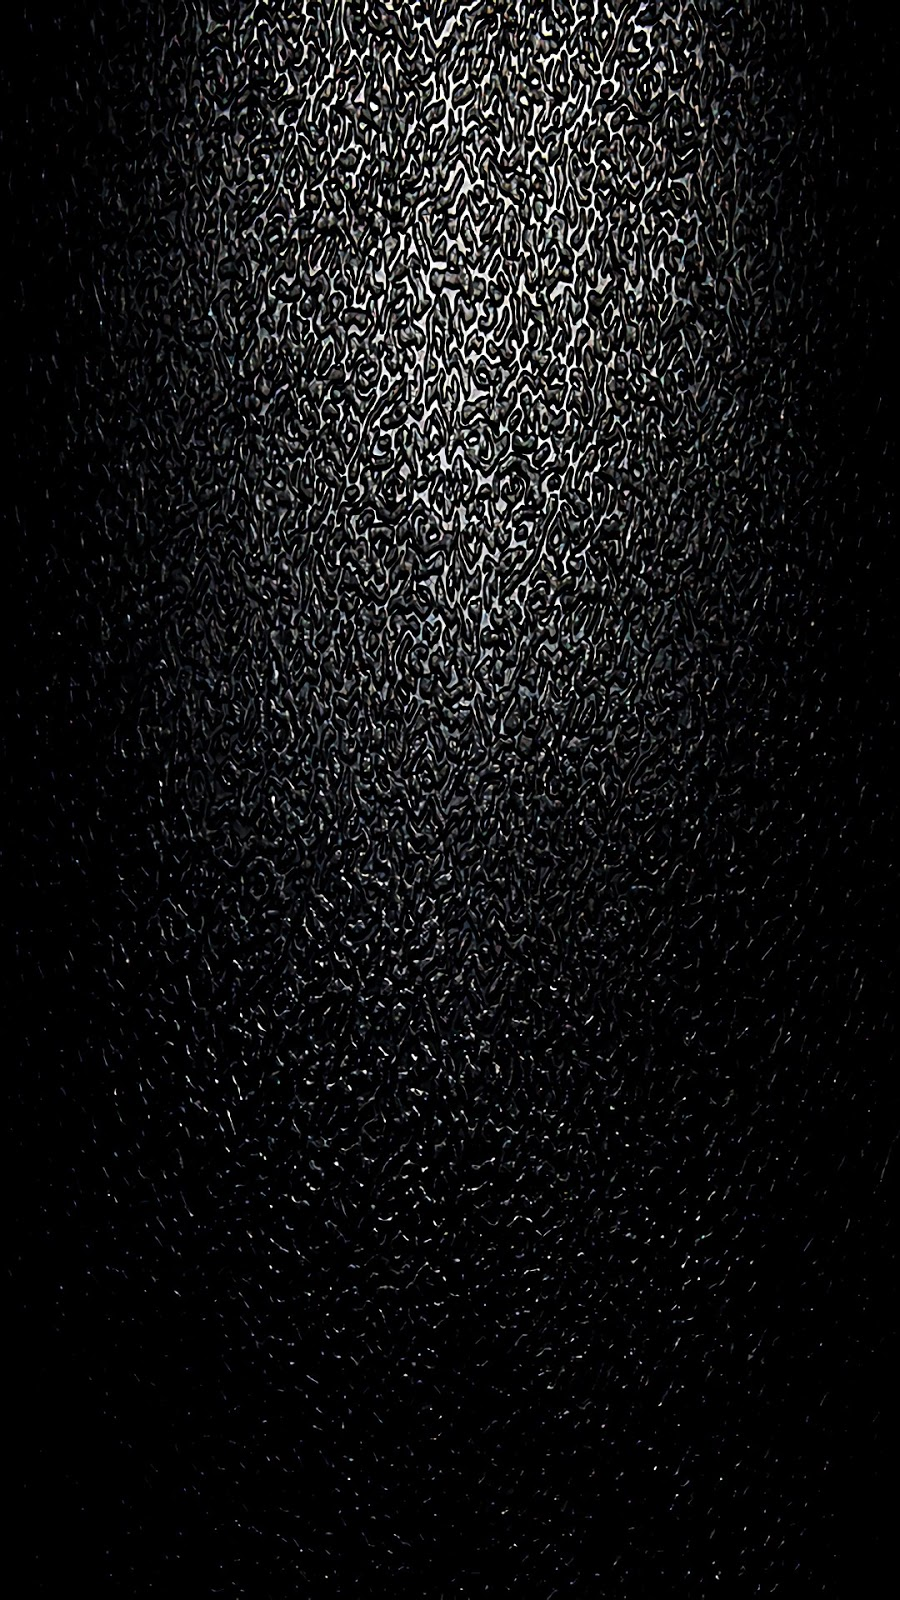 Samsung Galaxy J7 Prime 2 Wallpaper Download Magone 2016